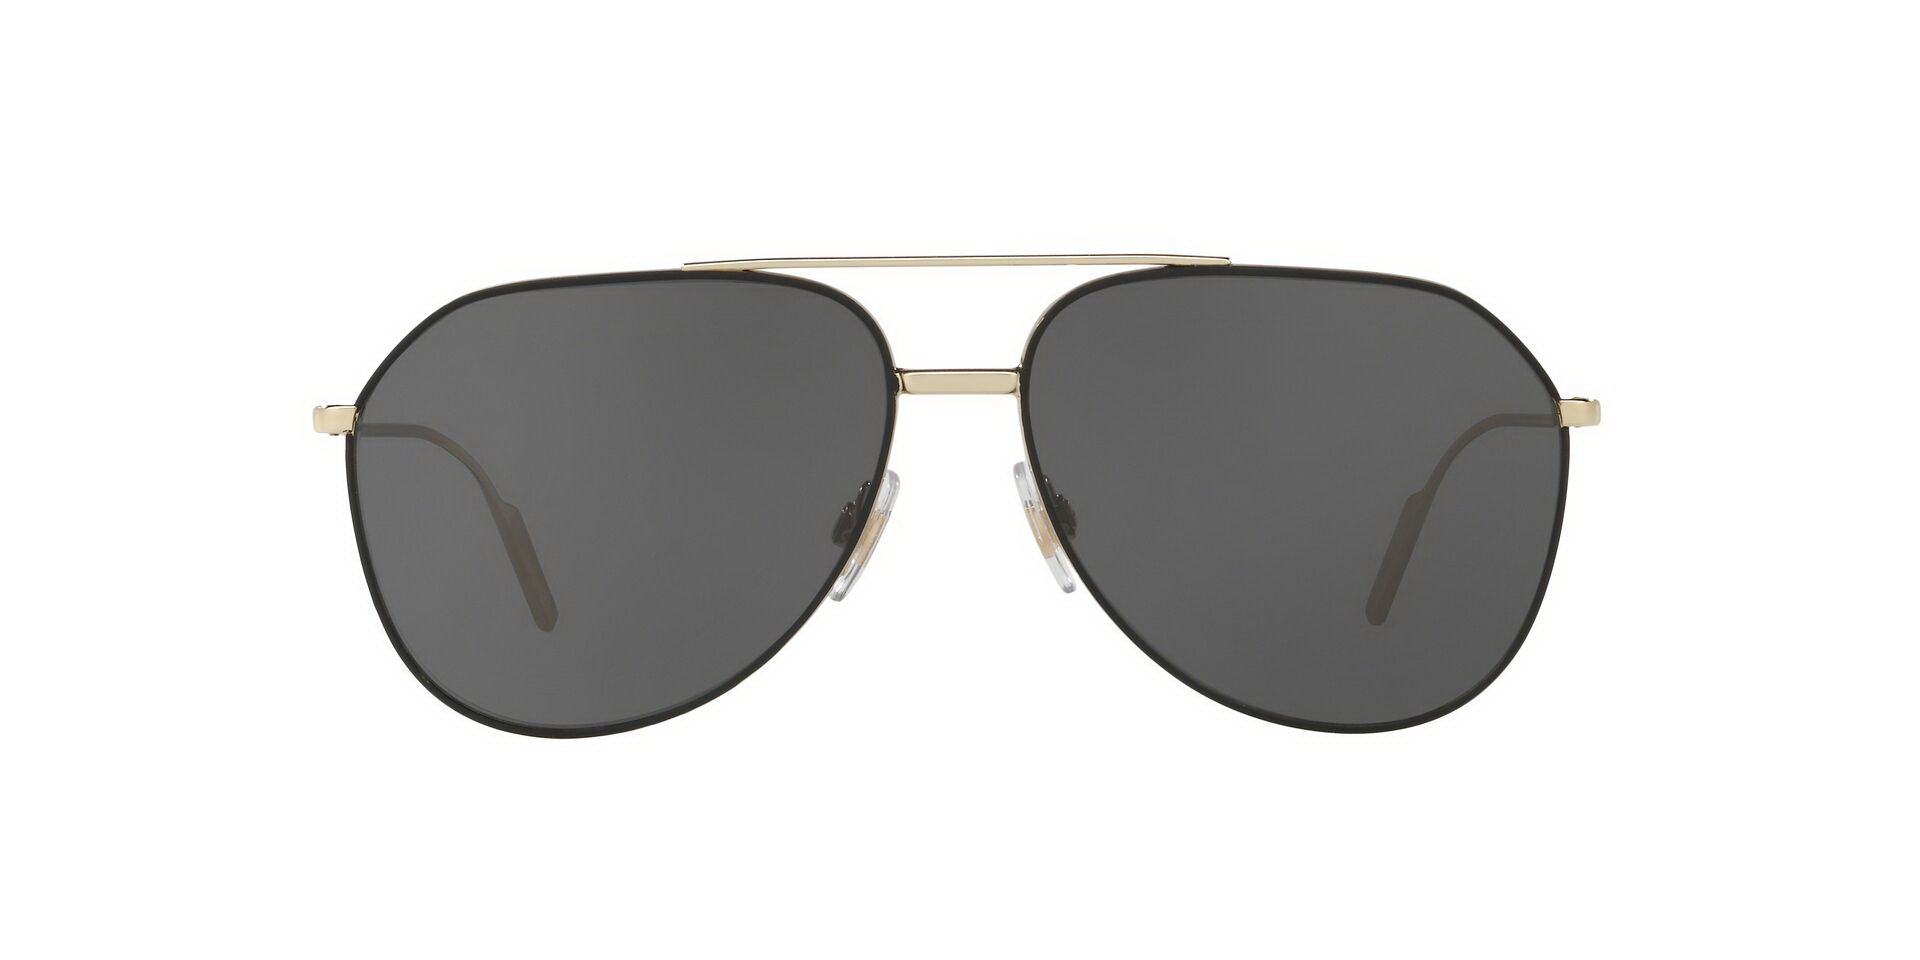 Солнцезащитные очки Очки с/з DOLCE&GABBANA 0DG2166 130587 фото